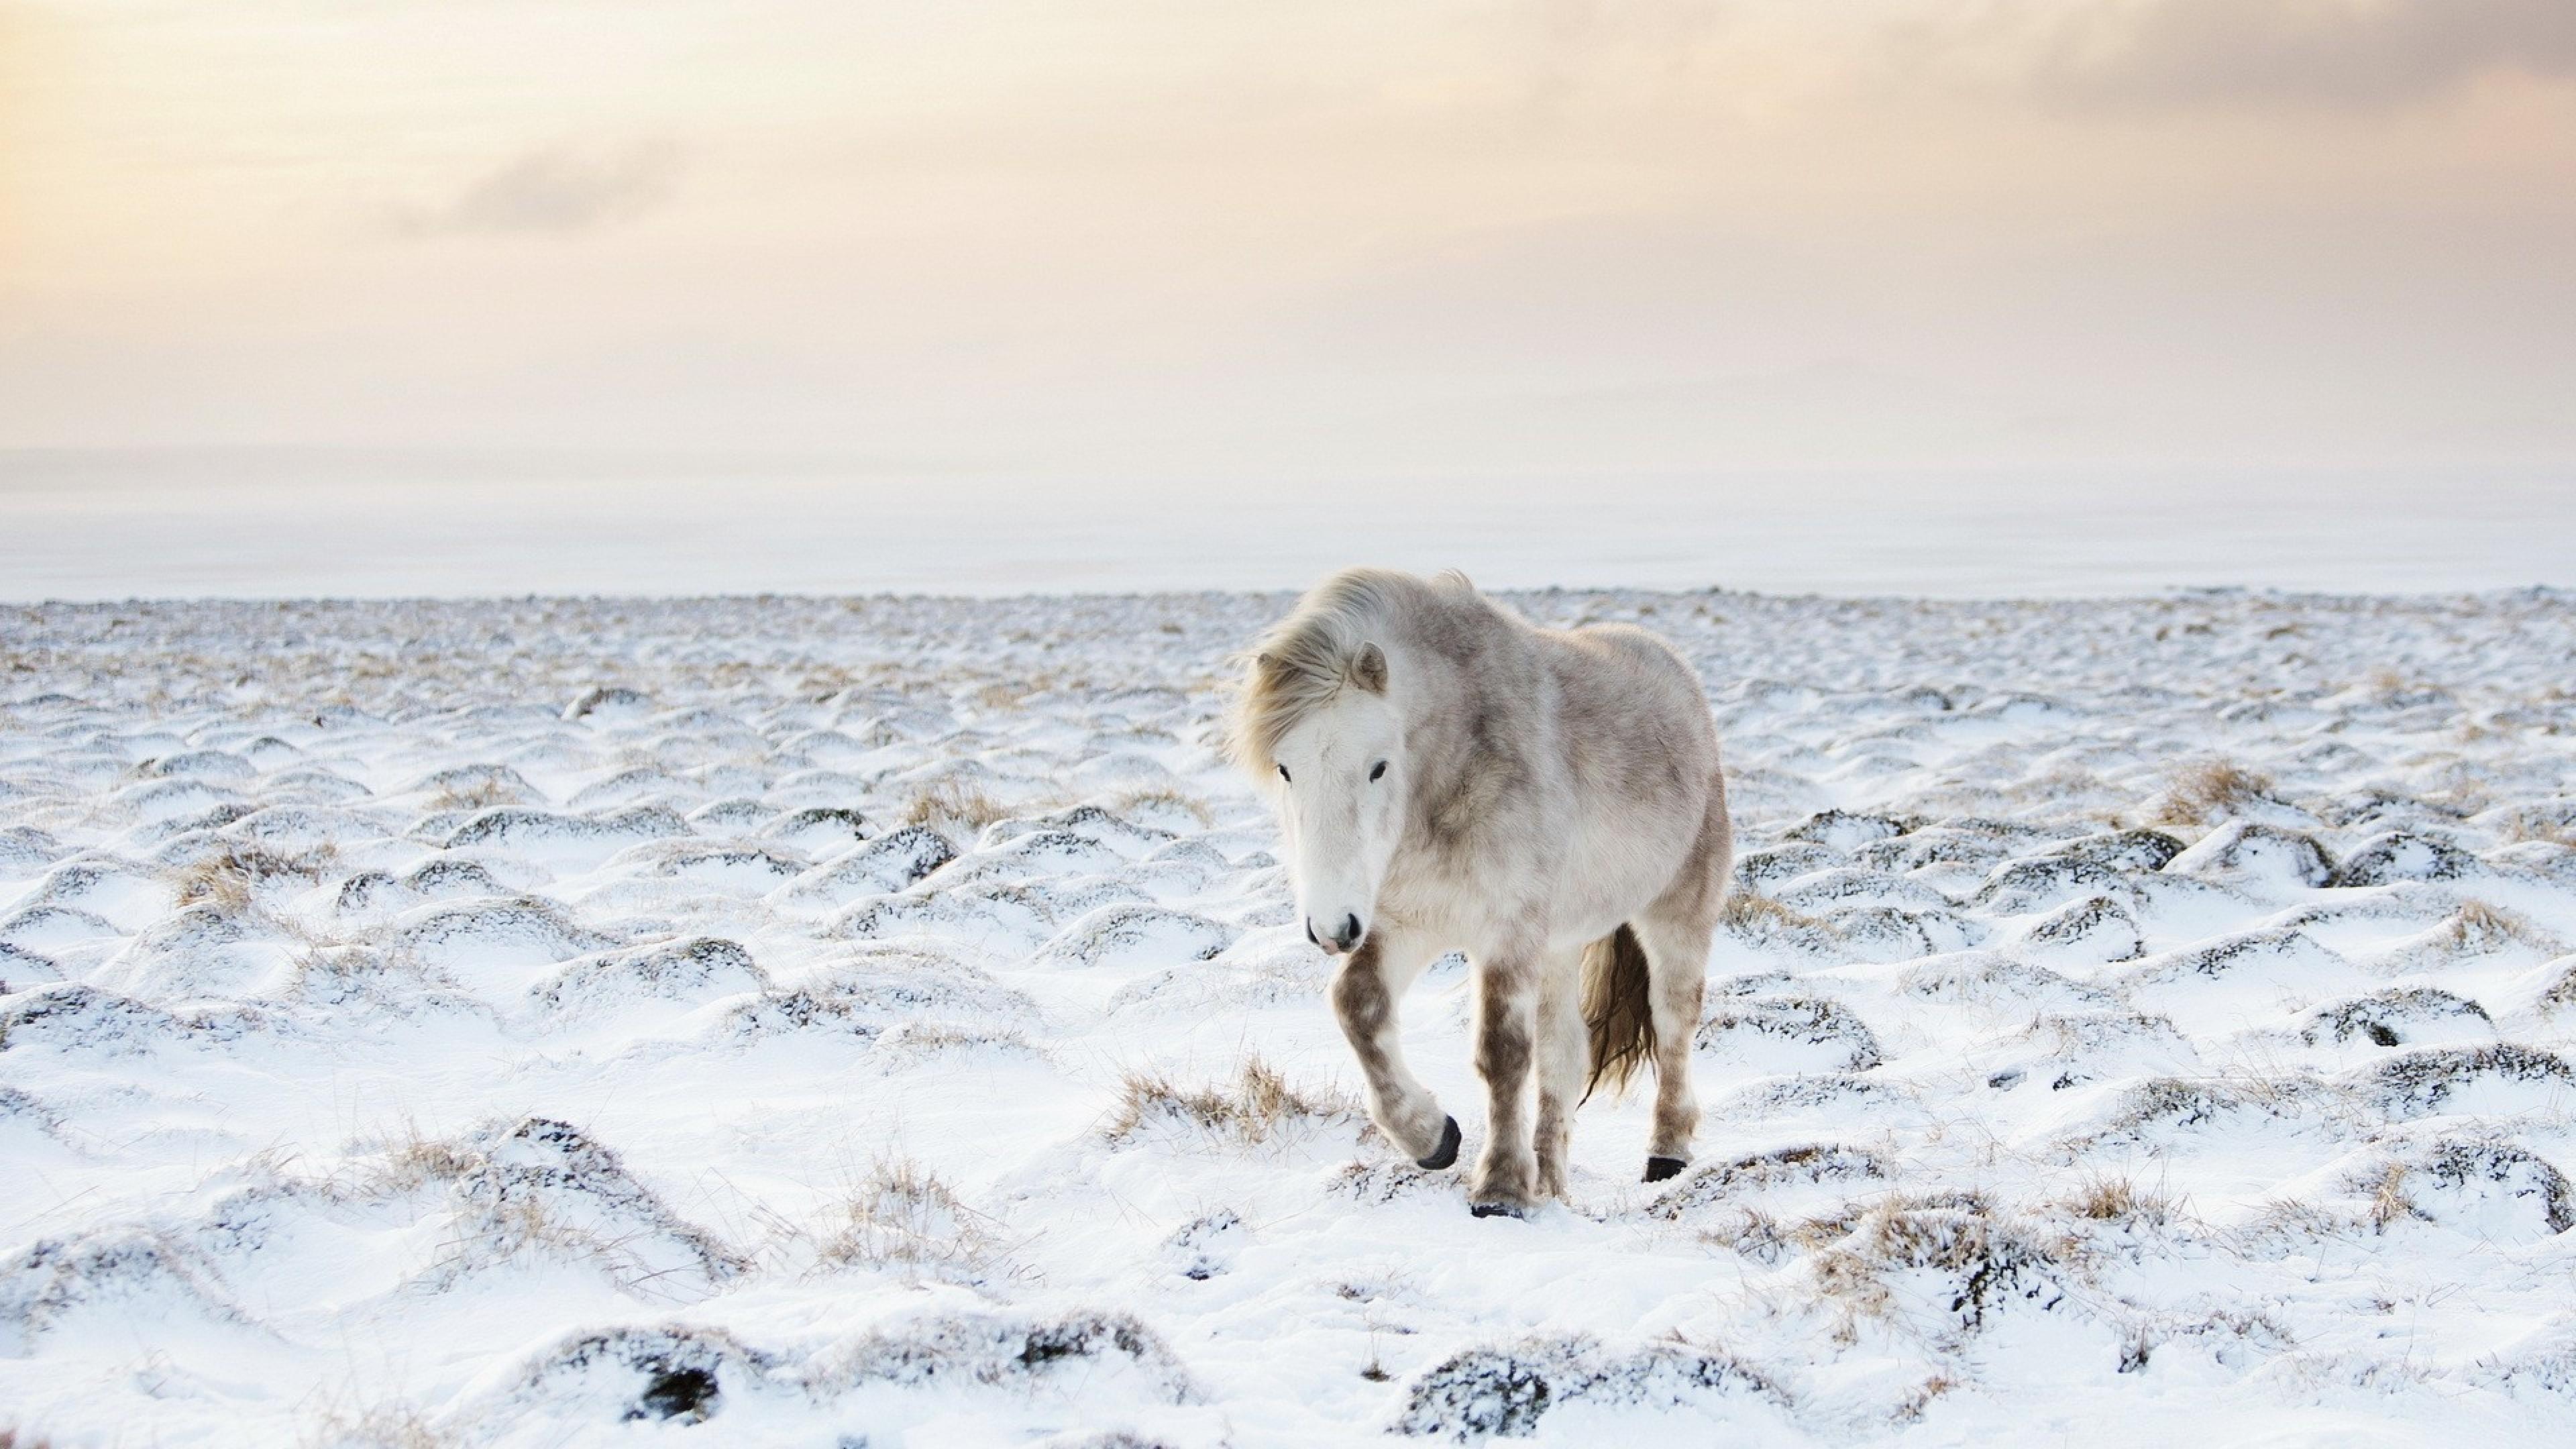 Wallpaper horse, snow, winter